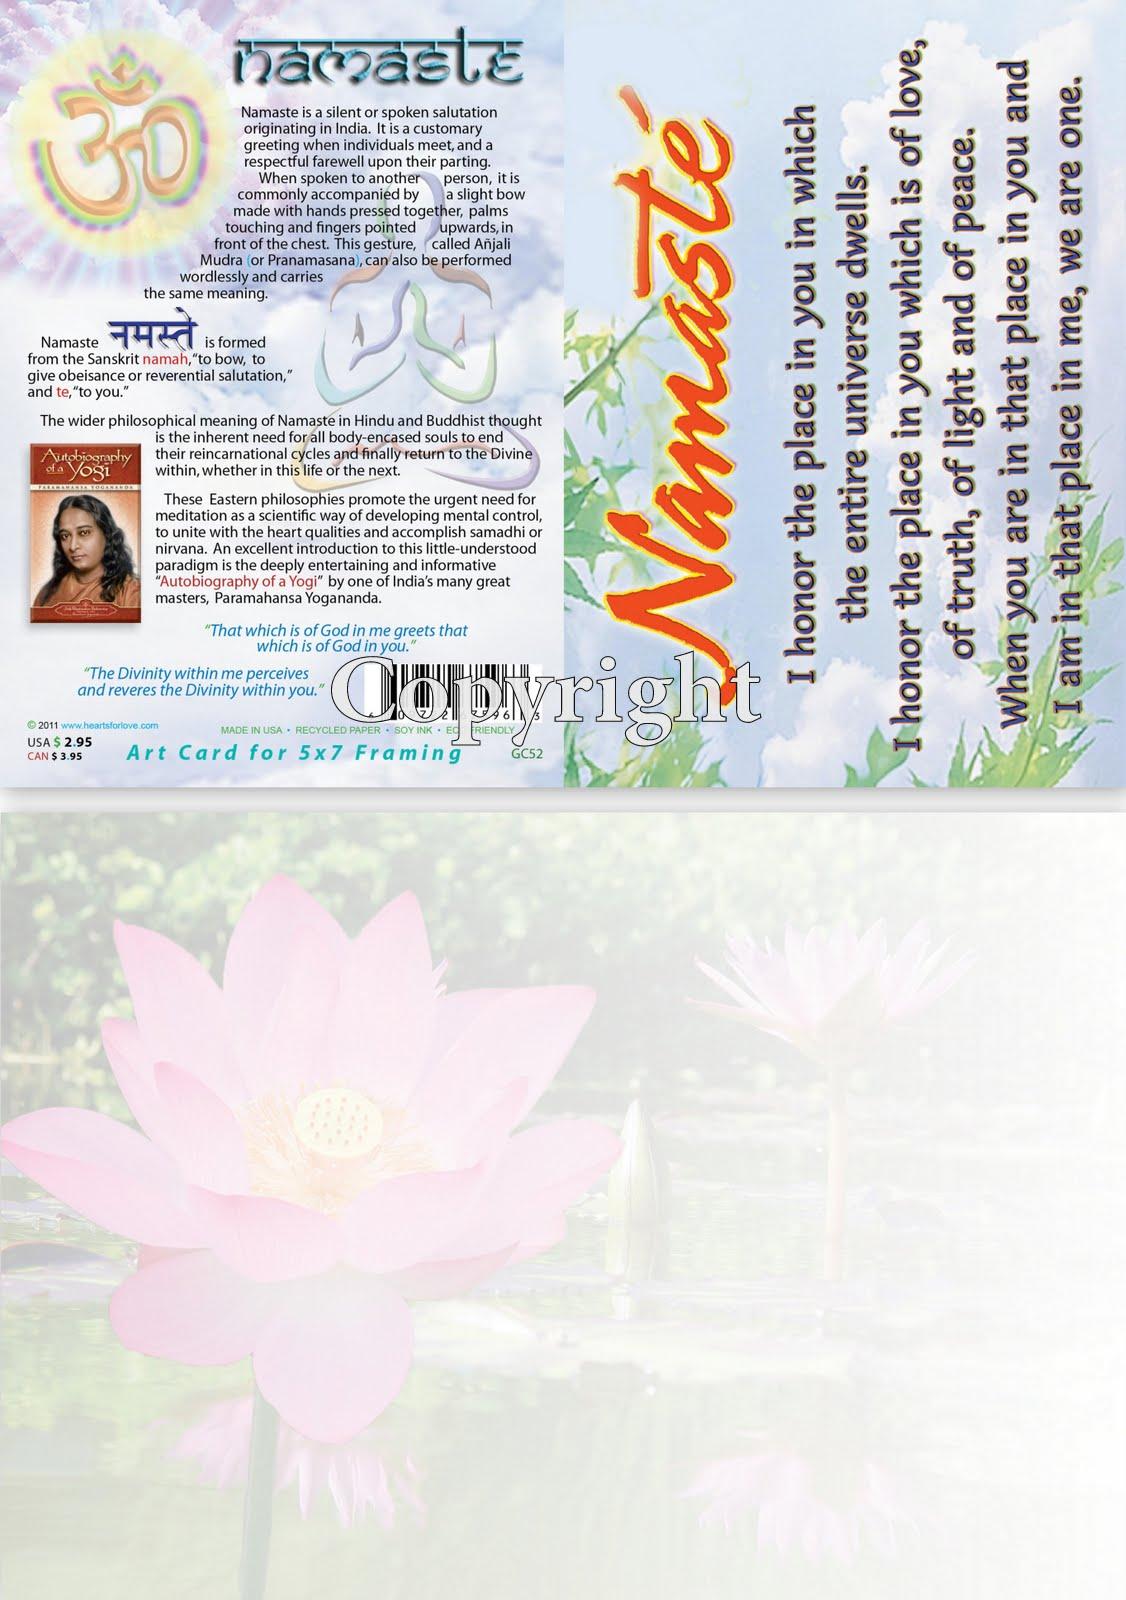 Buddhist greetings and salutations image collections greetings related post for buddhist greetings and salutations m4hsunfo